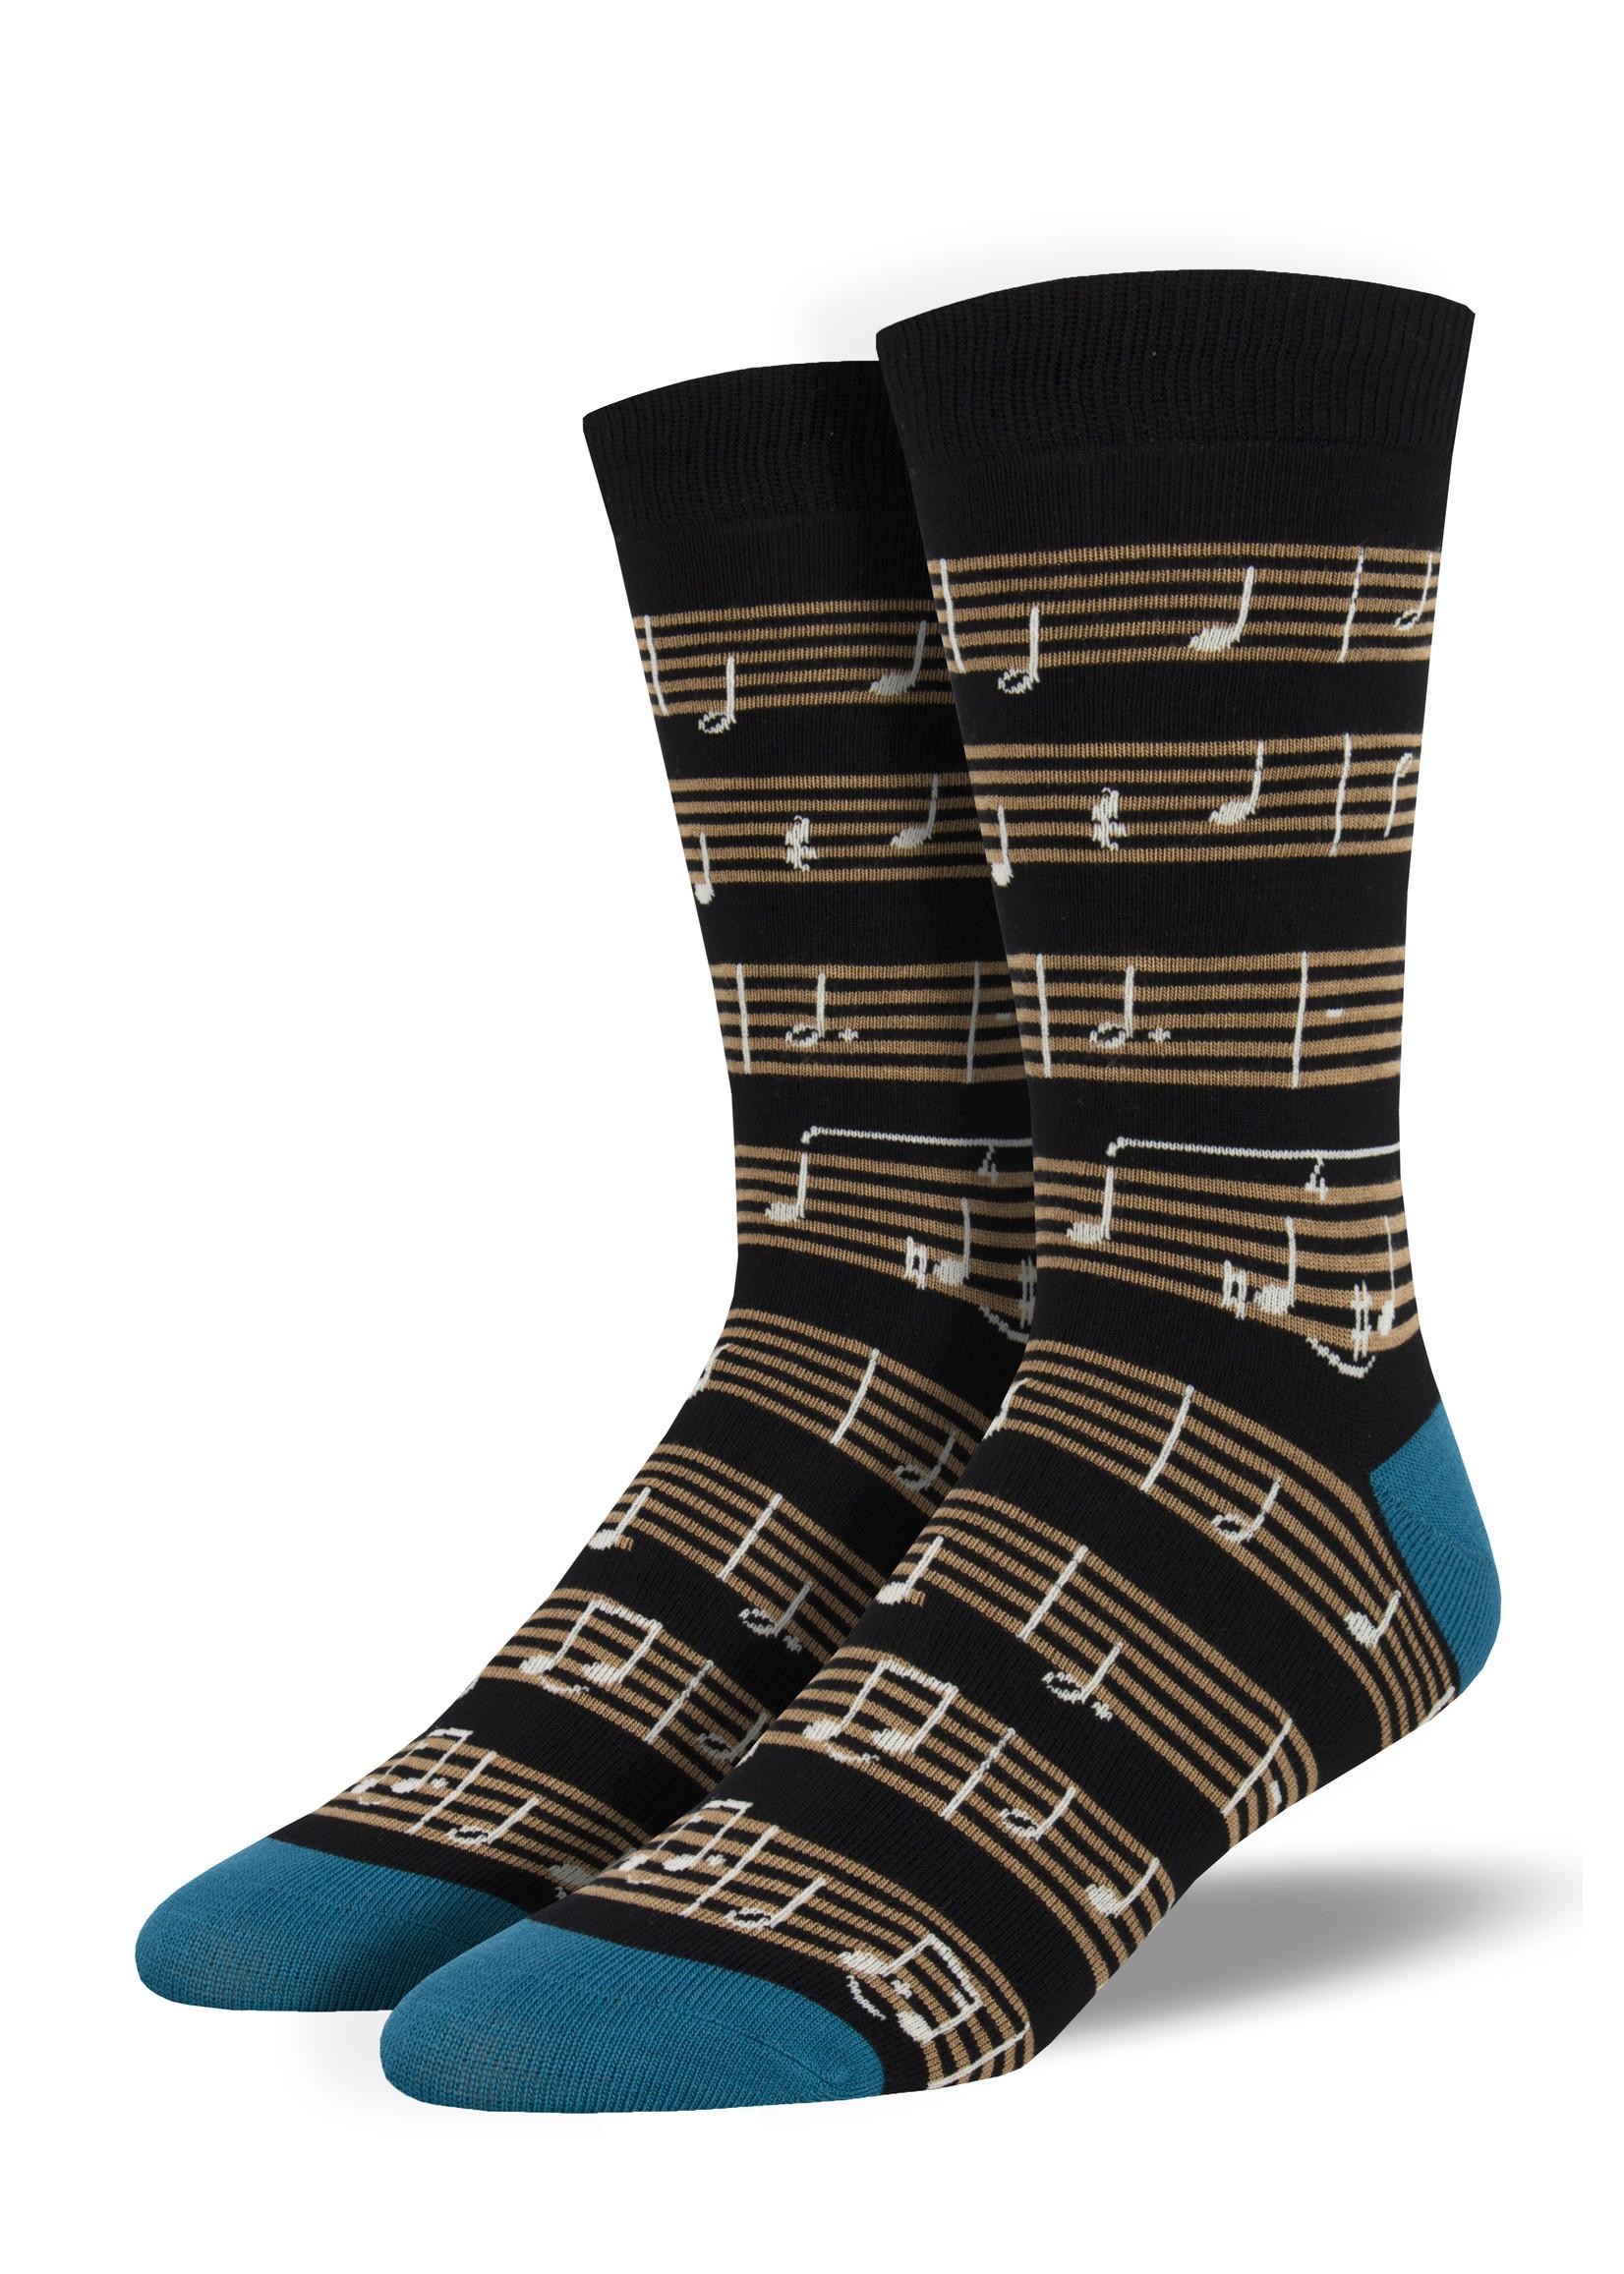 Socksmith Canada Inc MEN'S SHEET MUSIC SOCKS